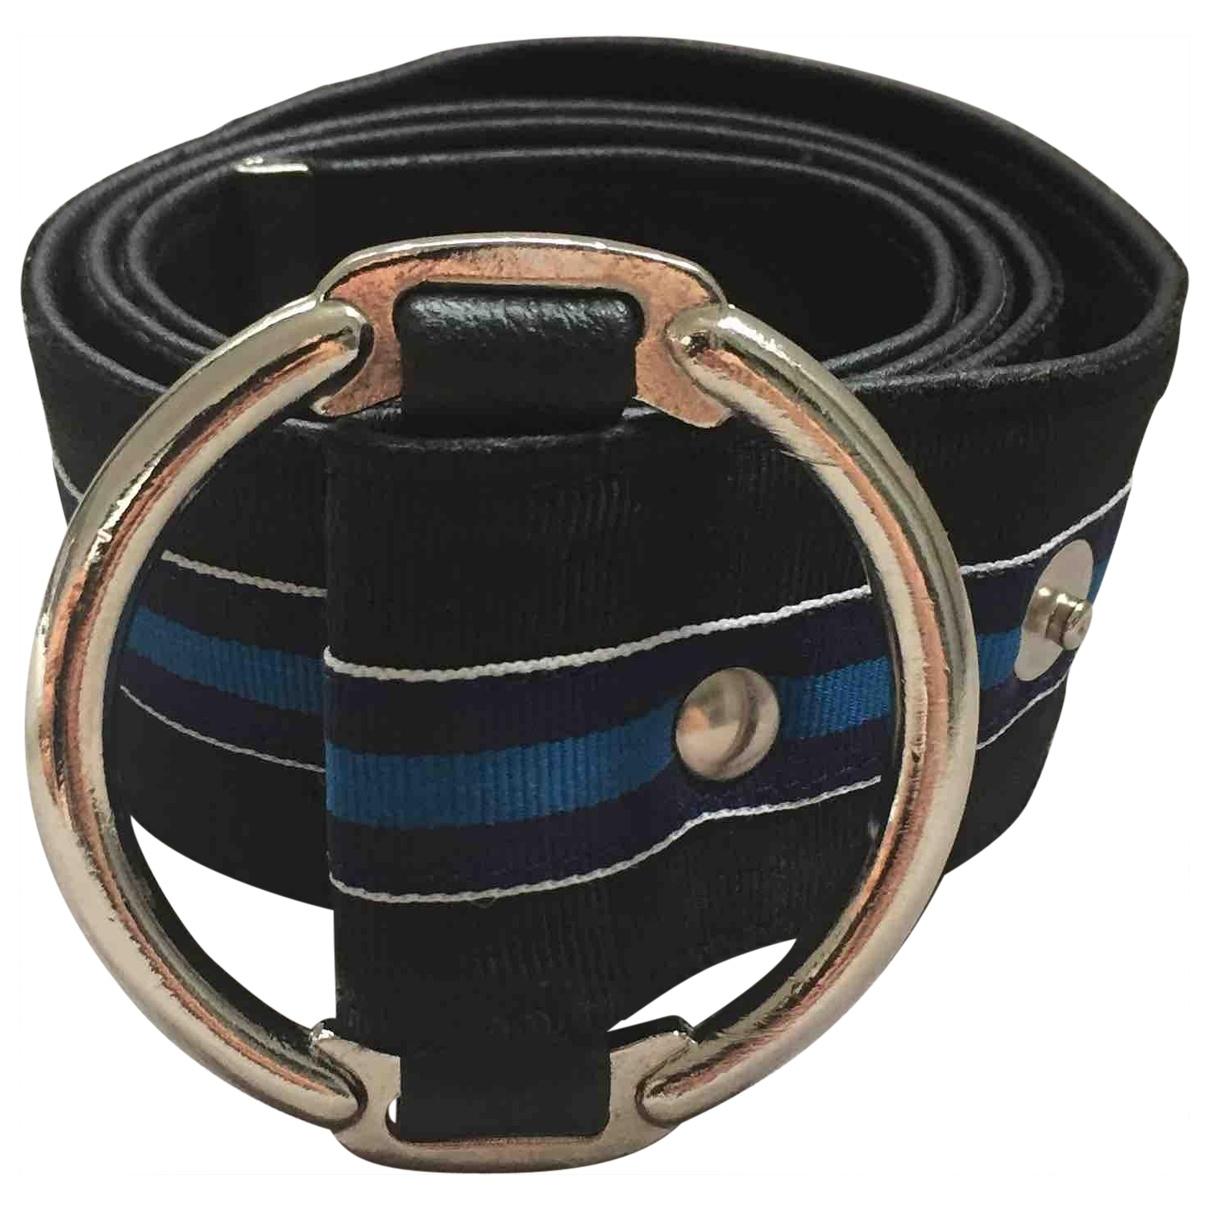 Lanvin \N Black Cloth belt for Women S